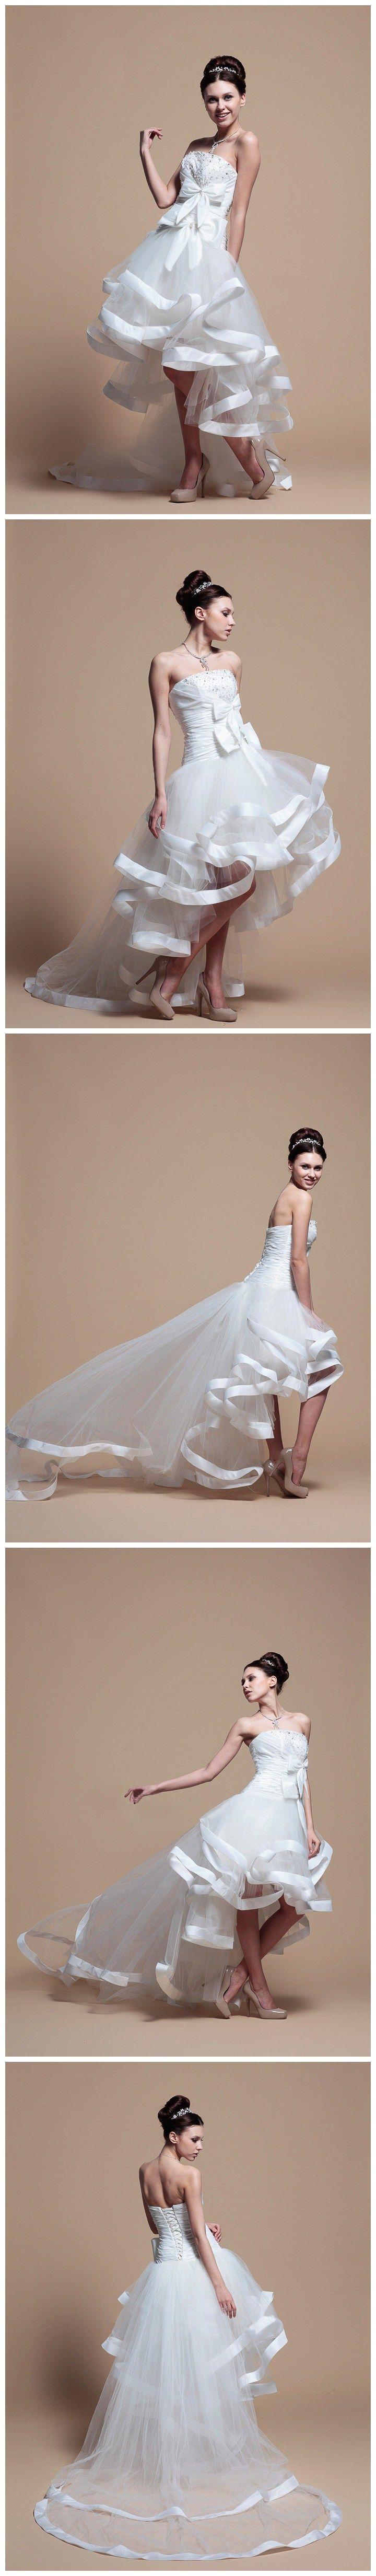 I am in love! I would definitely wear this as my wedding